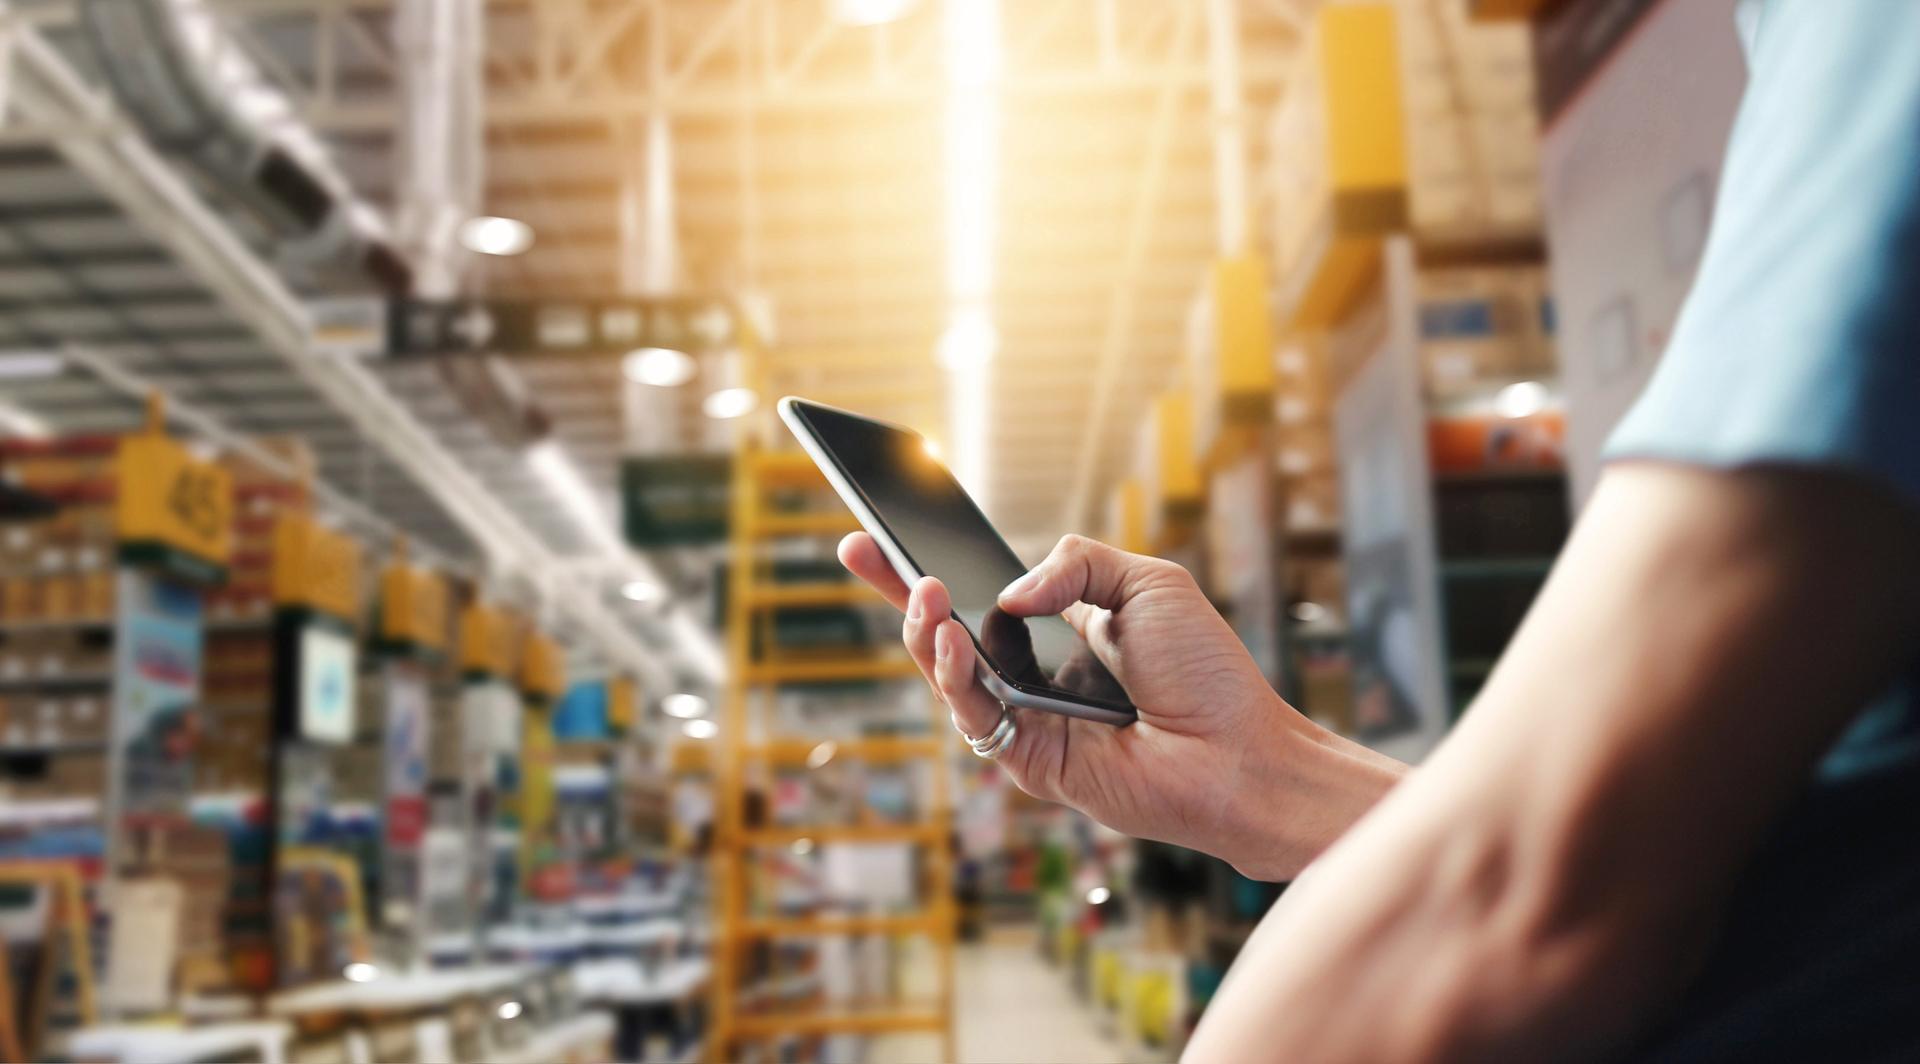 Logistik-Mitarbeiter prüft im Lagerhaus RFID-Transponder mit Smartphone